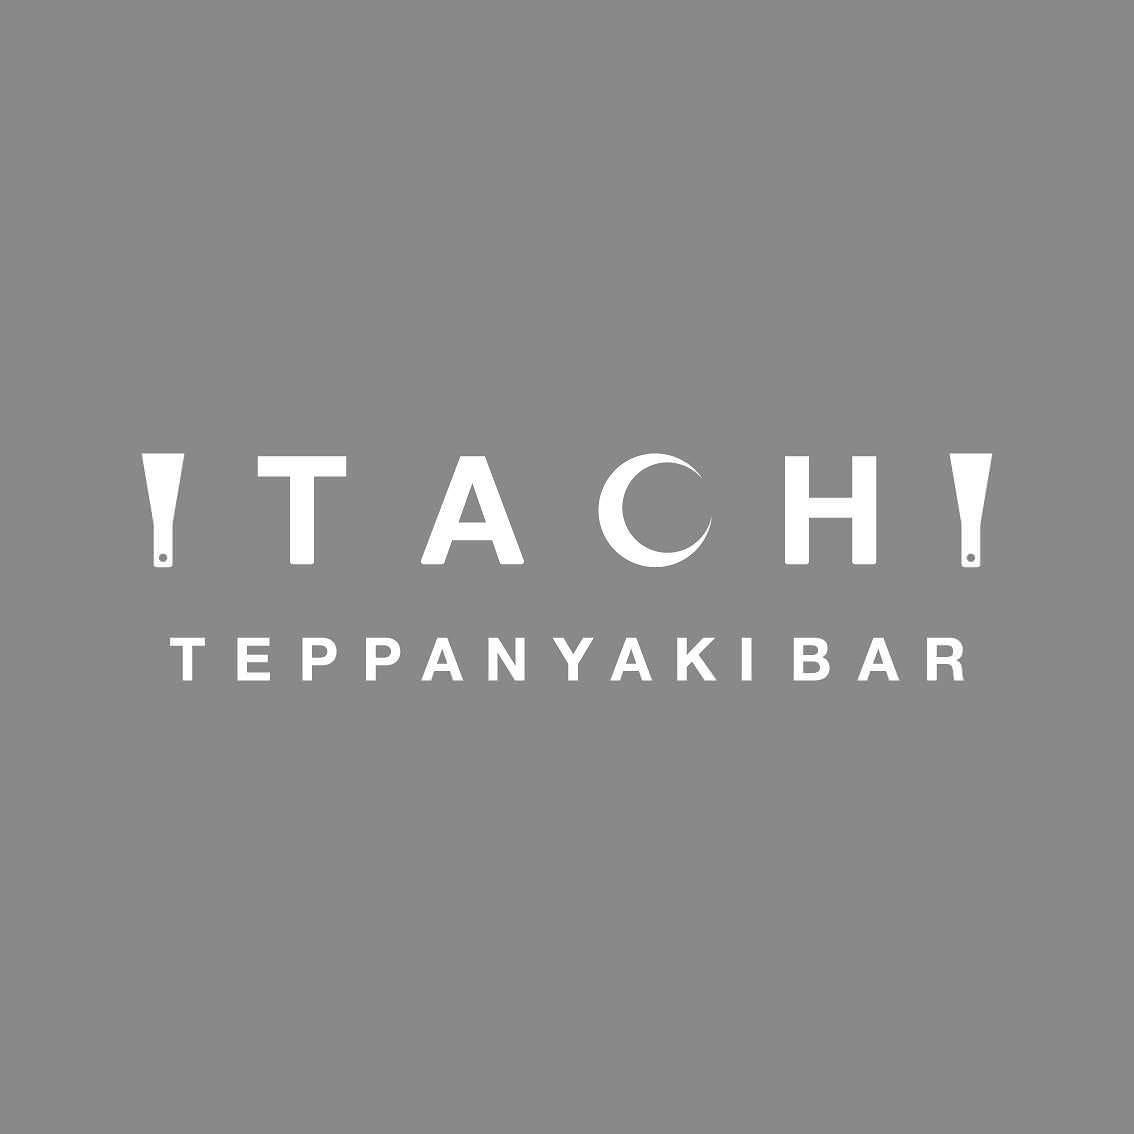 渋谷鉄板バー ITACHI